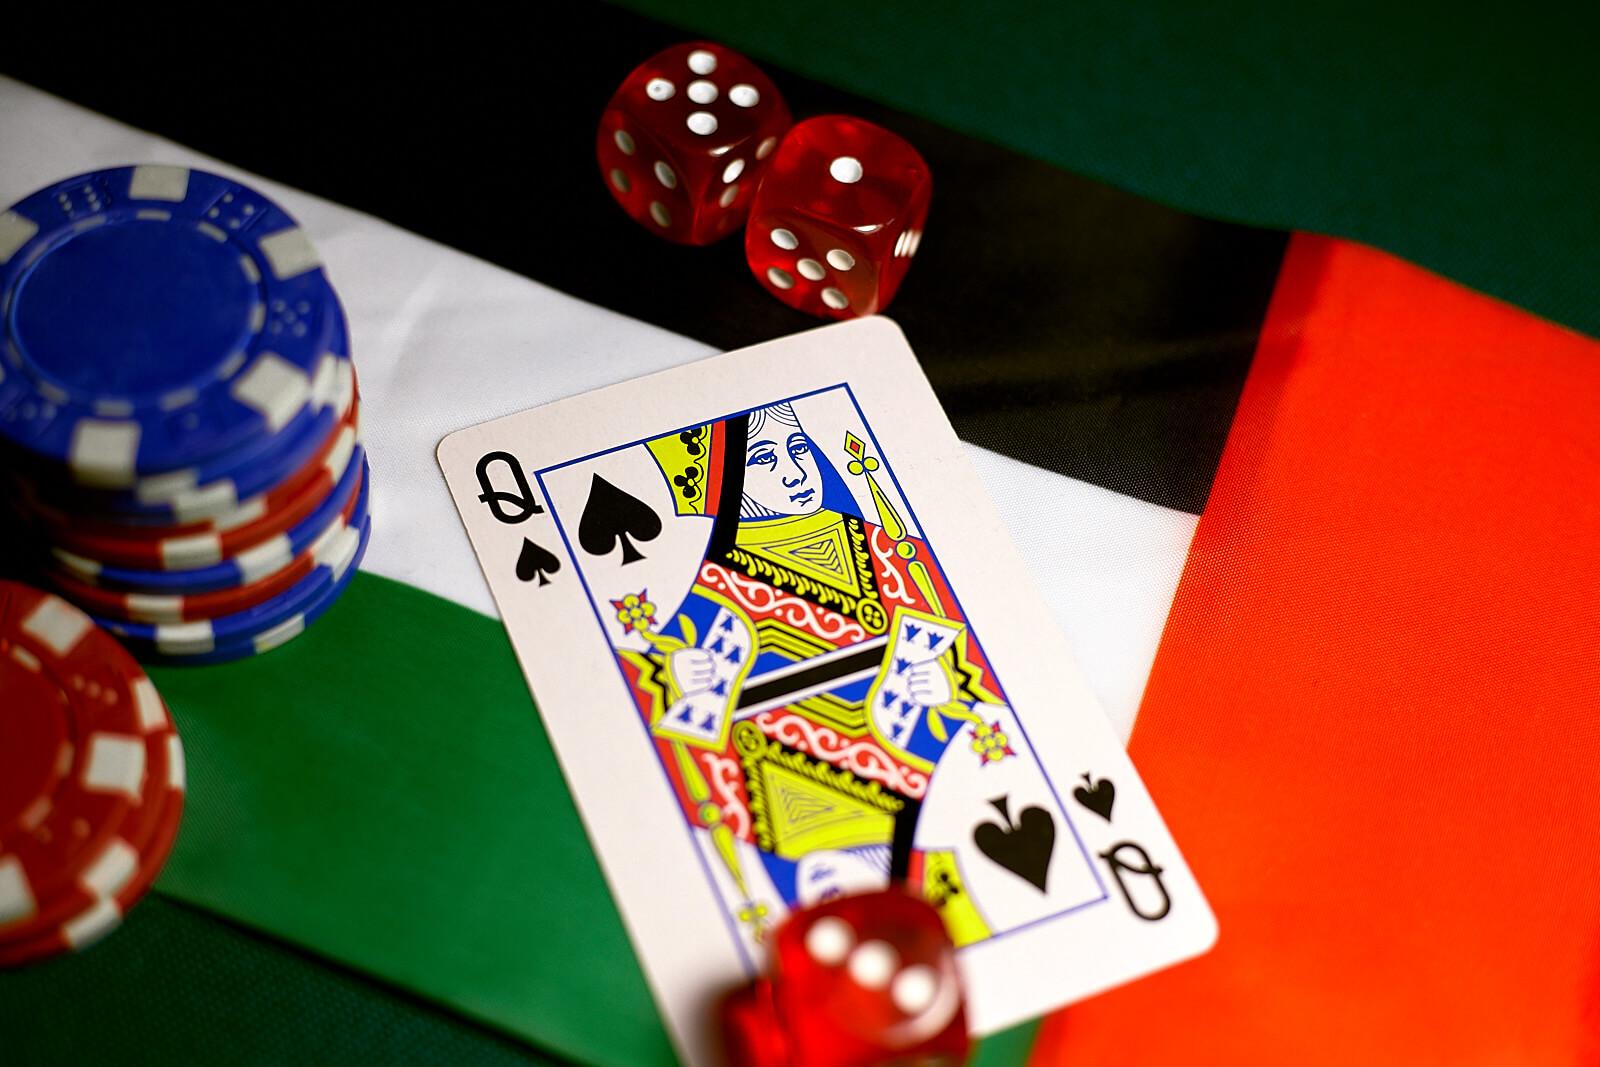 Poker Gambling Casino Card Game Poker Table